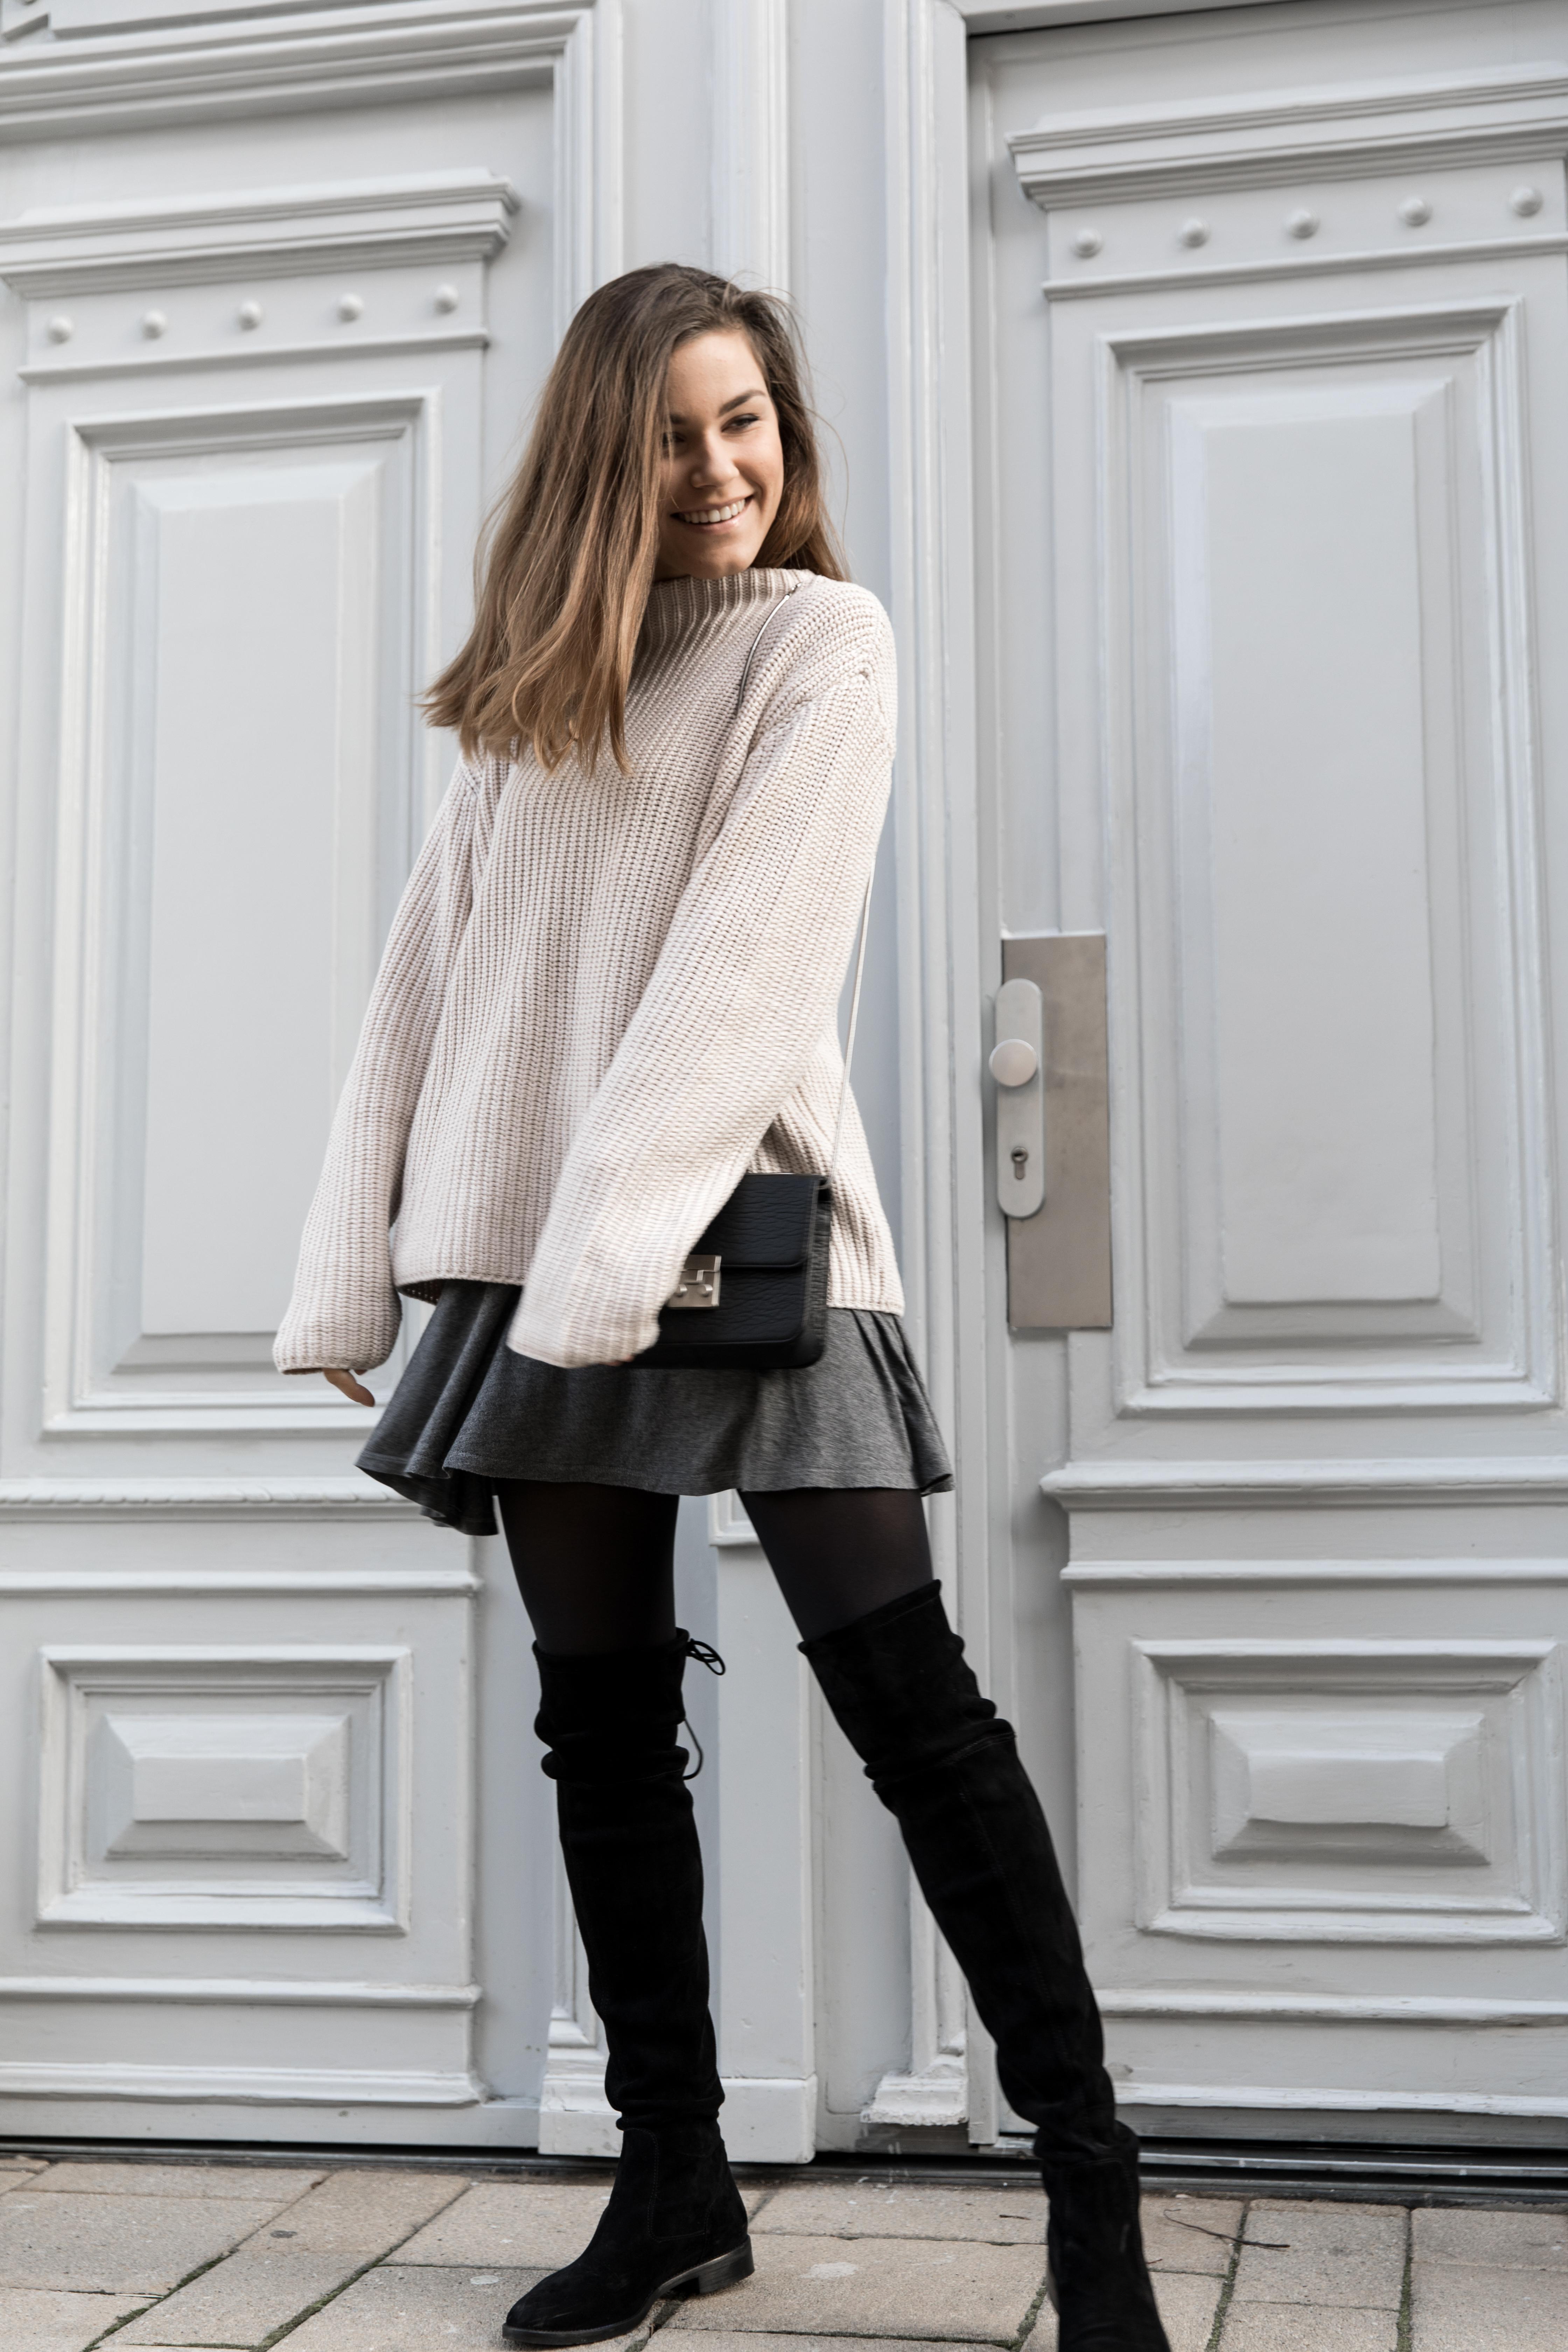 annalaurakummer-outfit-not-engaged-overknee-stiefel-12